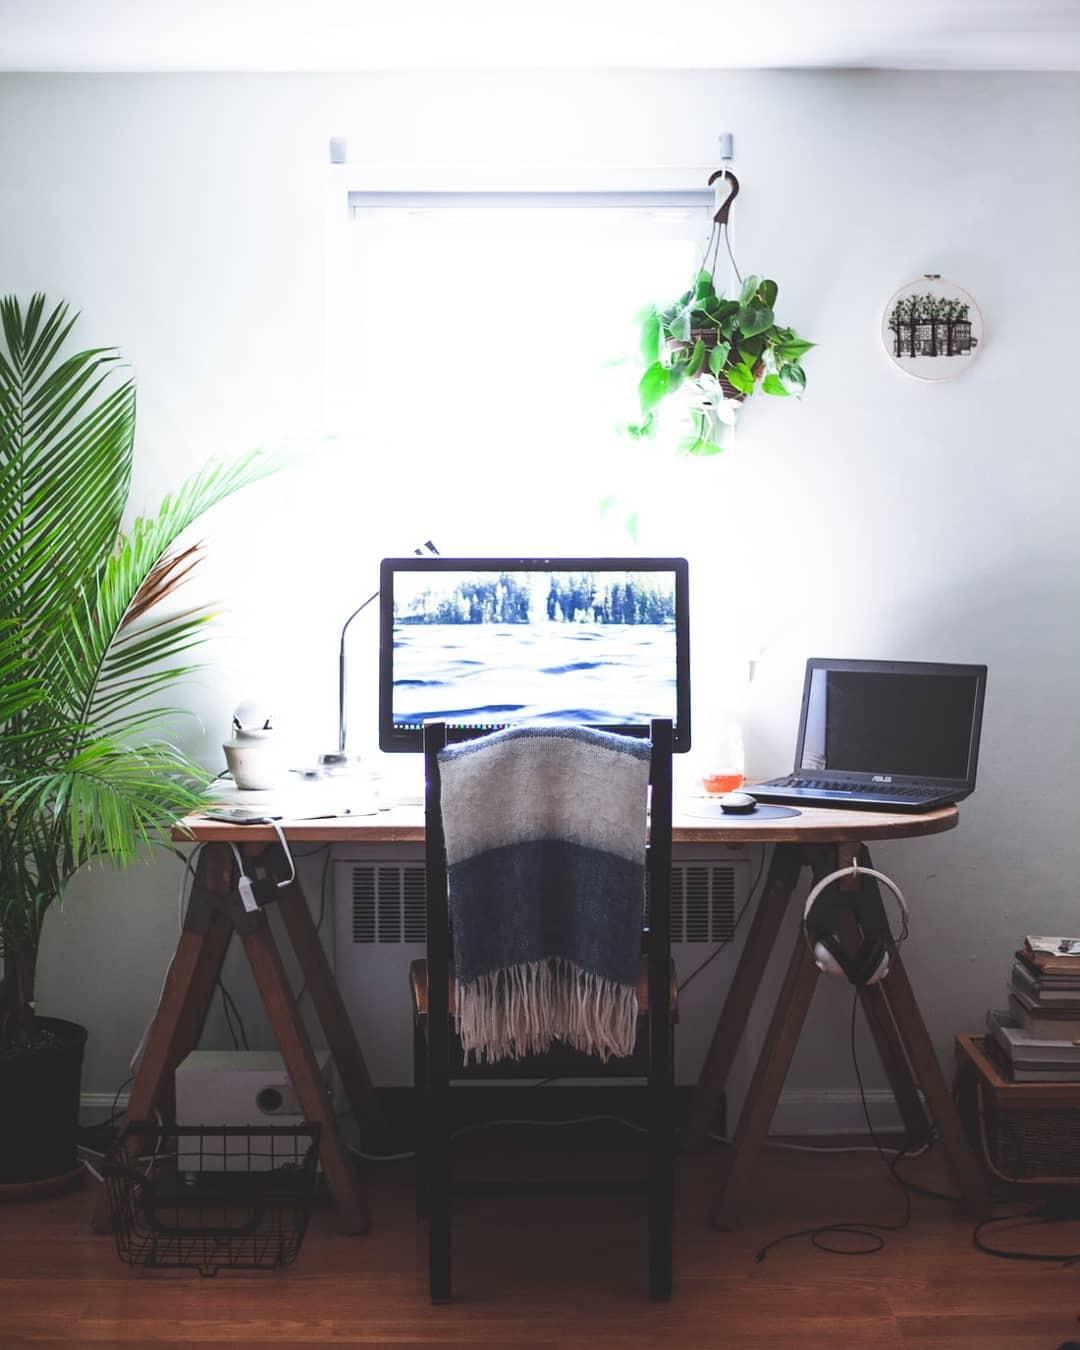 Work from home desk setup